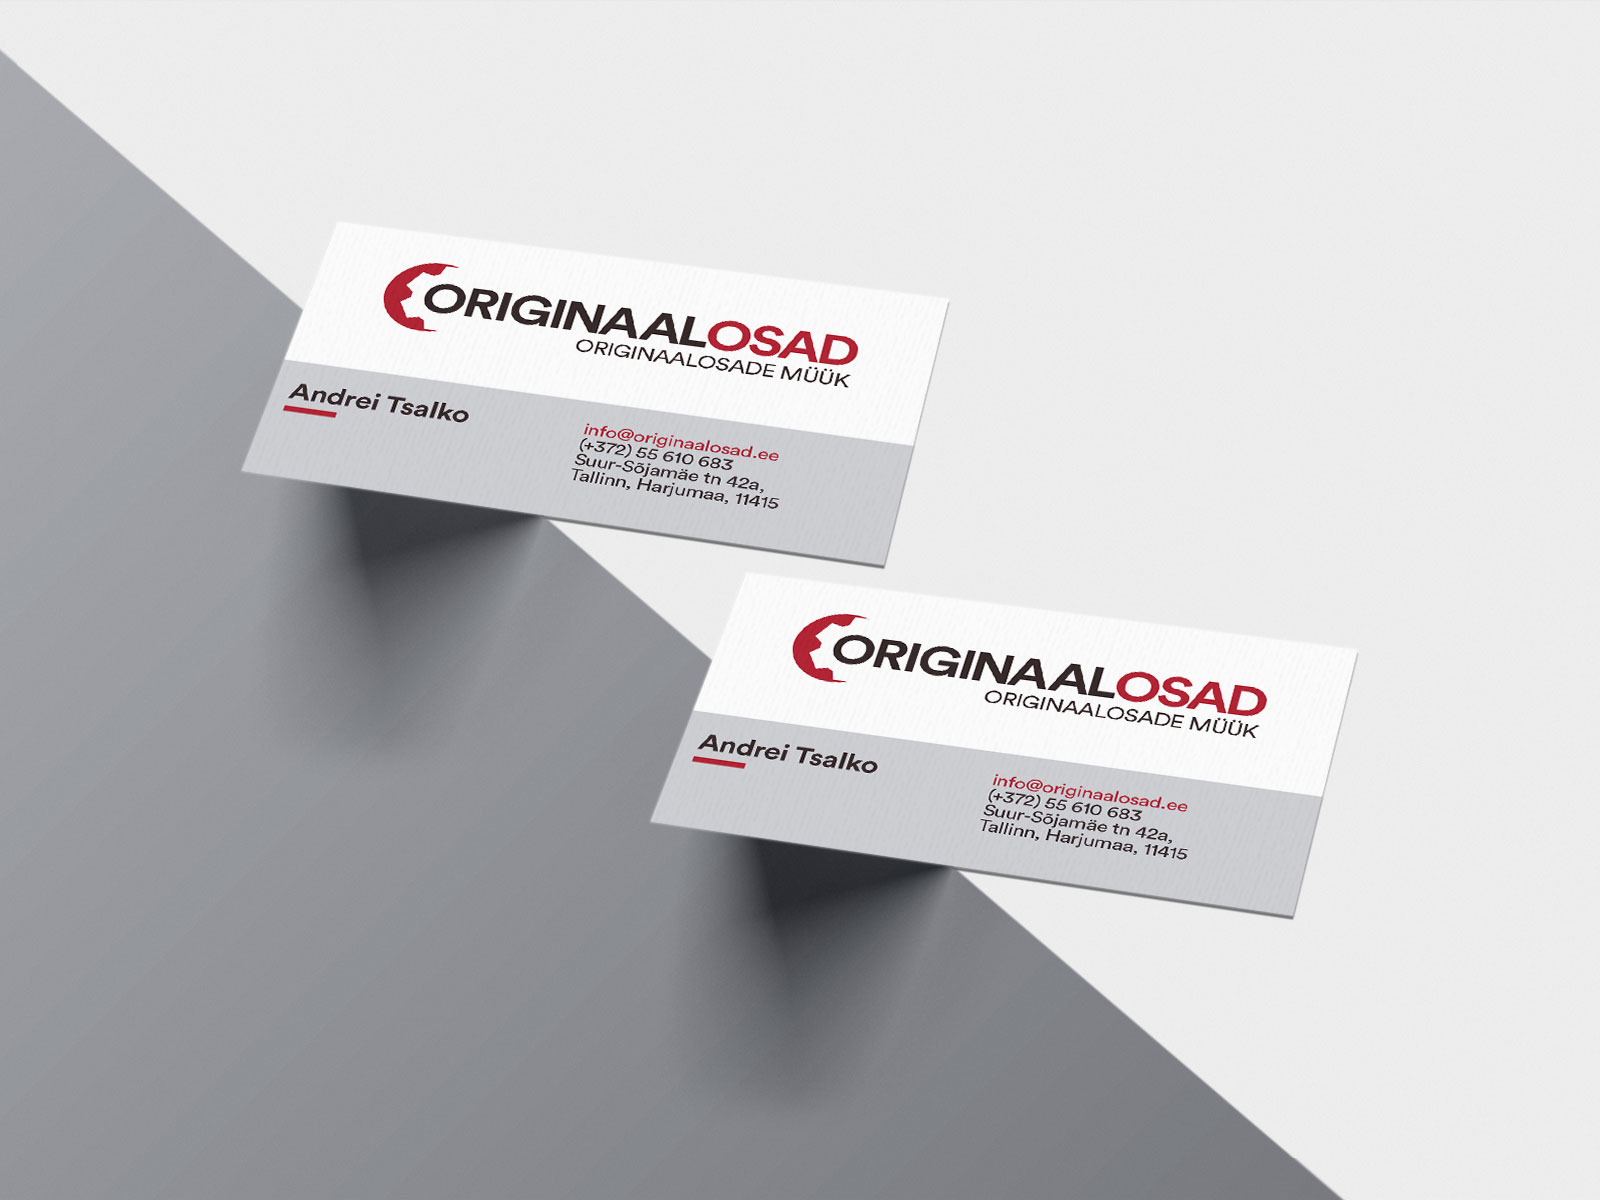 originalosad business card